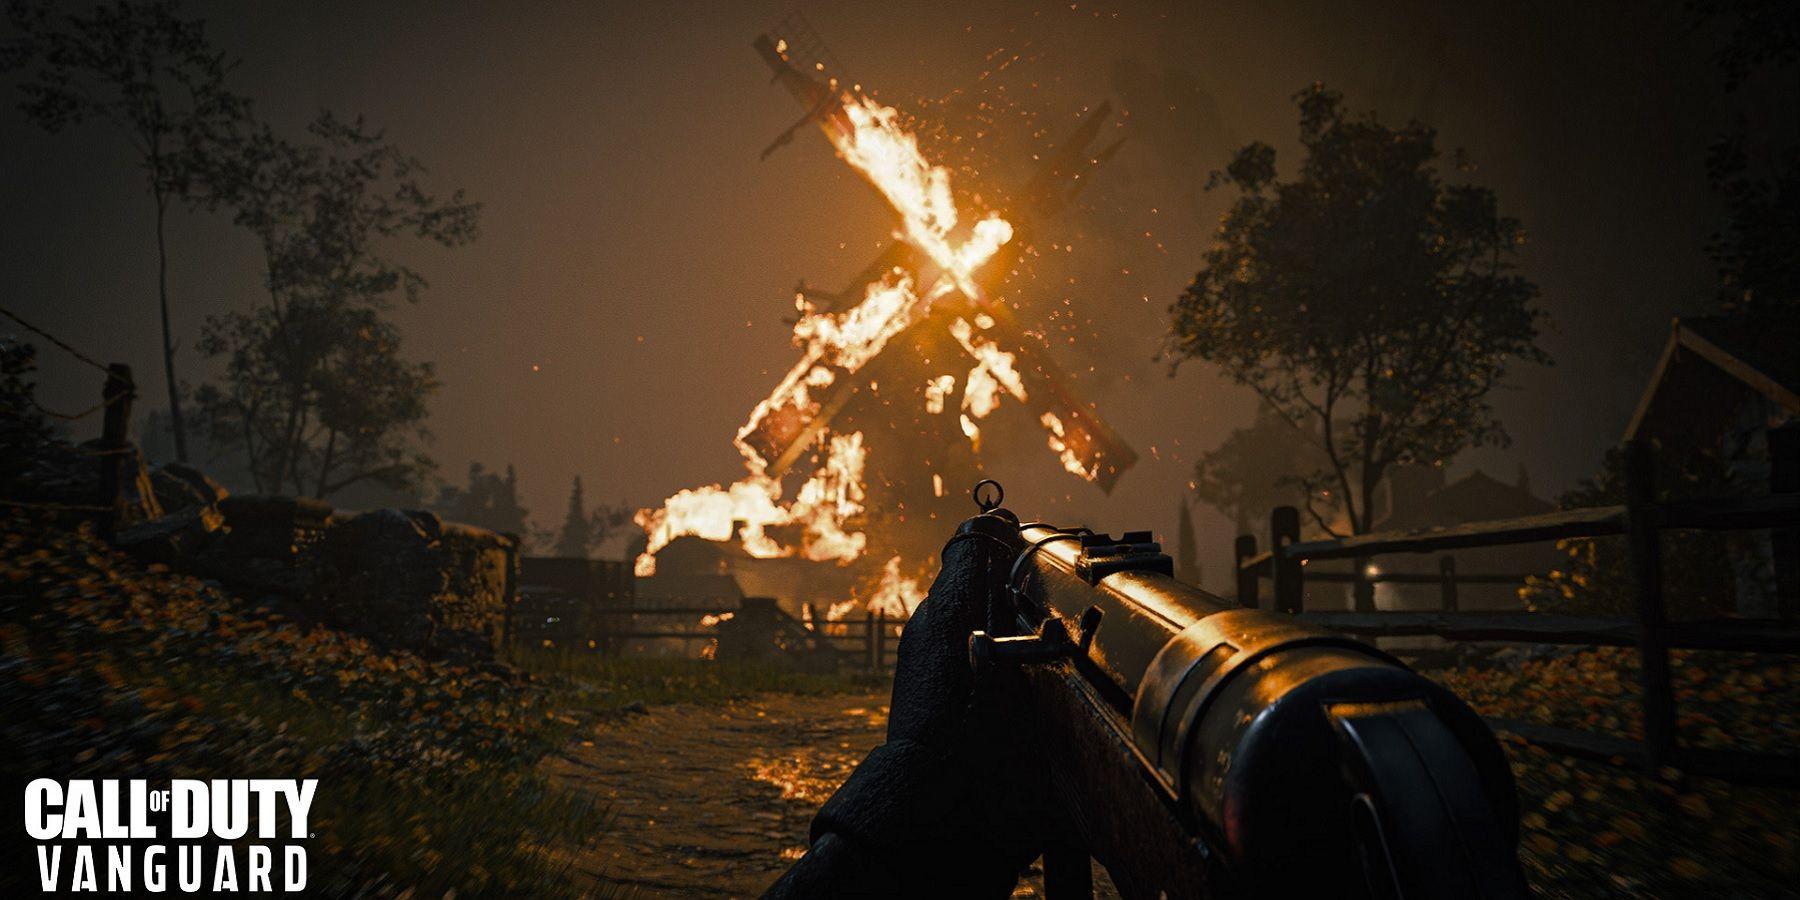 Call of Duty: Vanguard Has Massive File Size